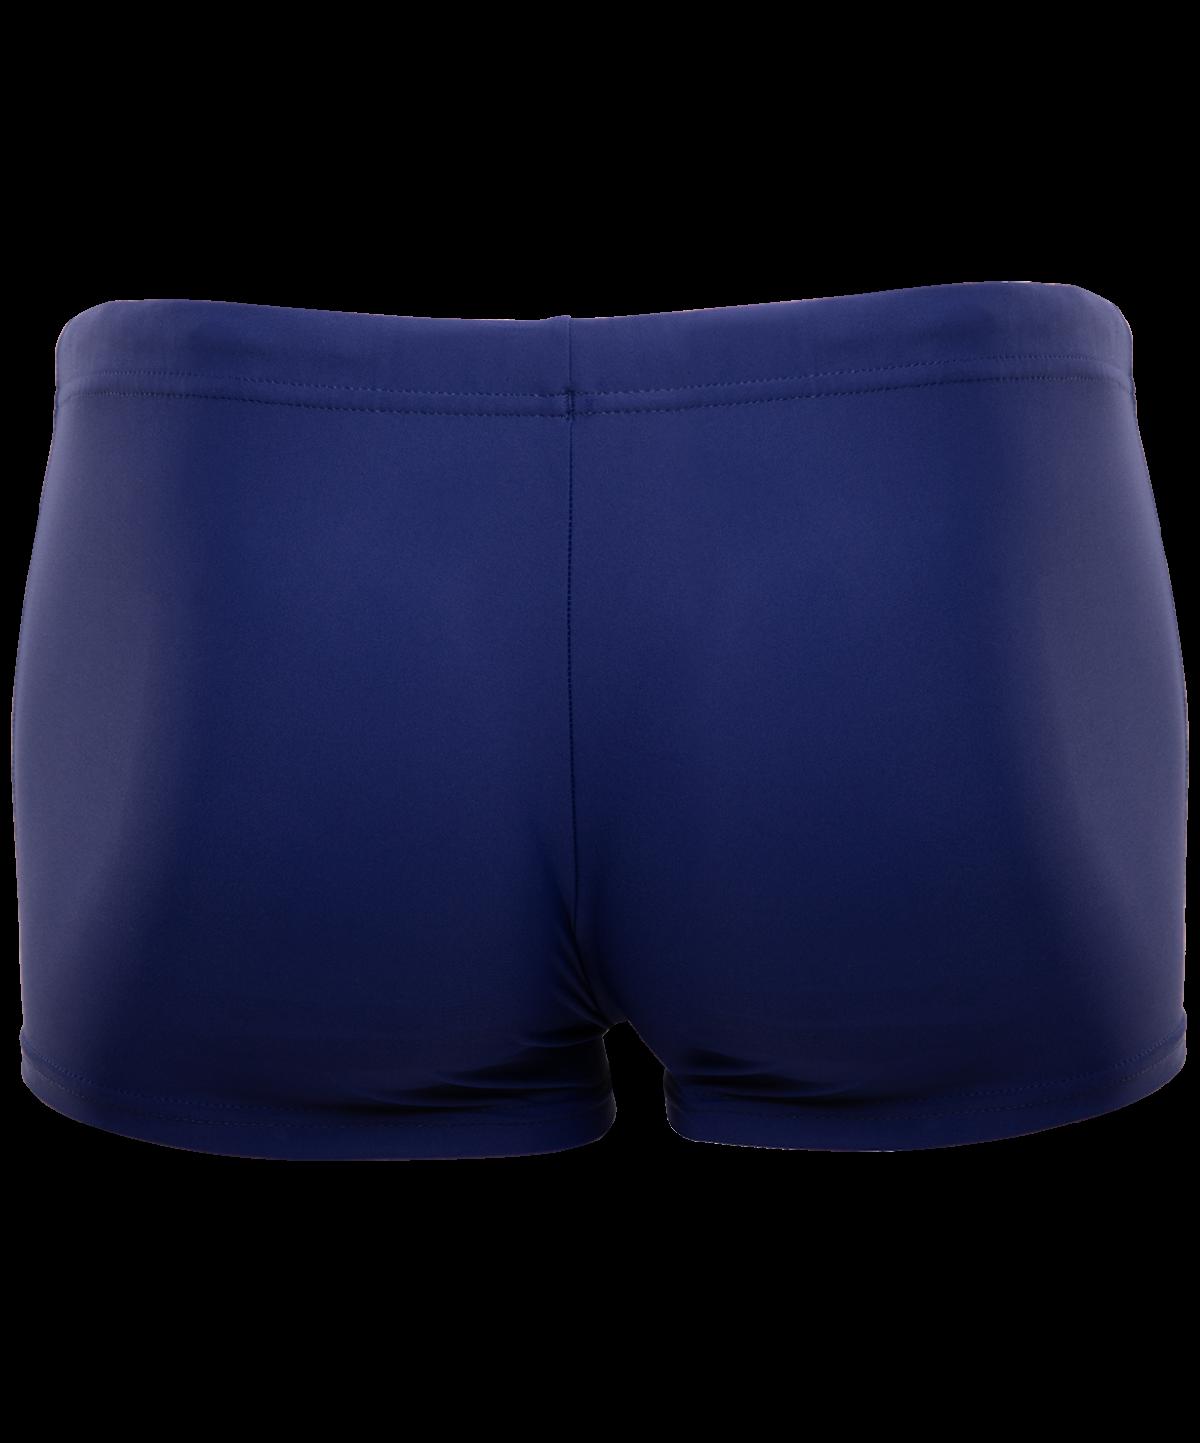 COLTON Sharp Плавки-шорты мужские (44-56)  SS-1988: темно-синий - 2